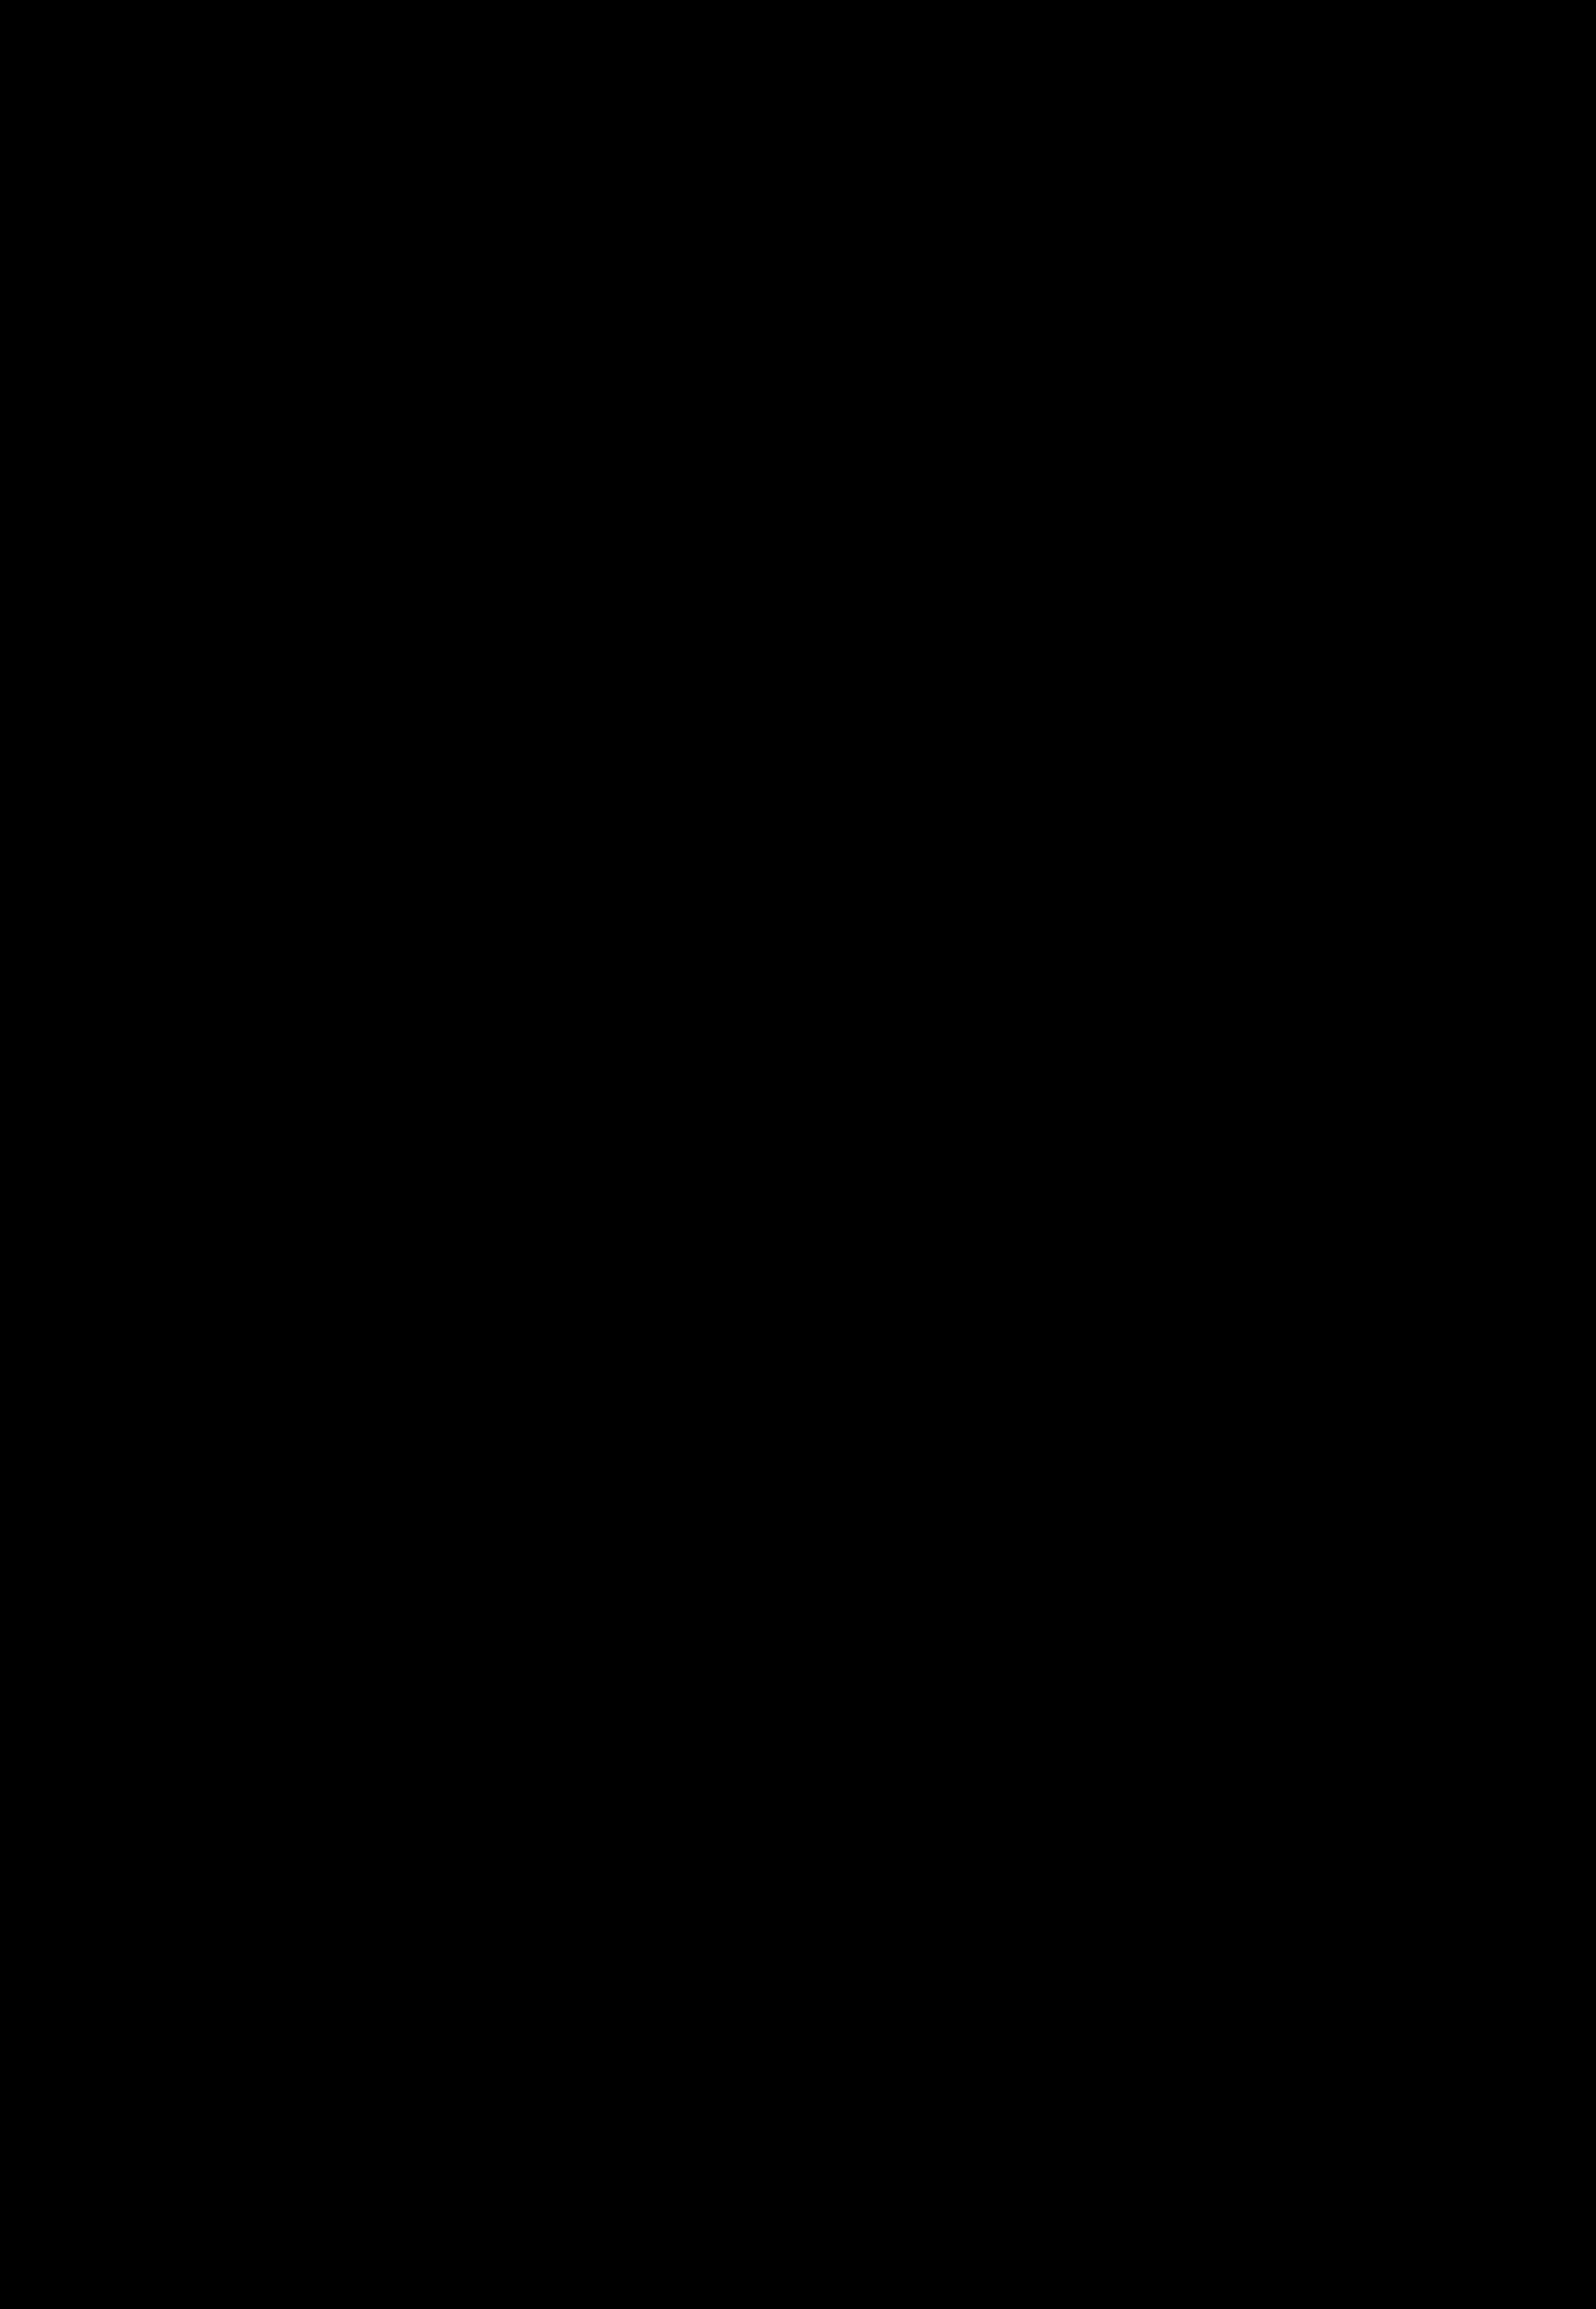 North arrow clipart